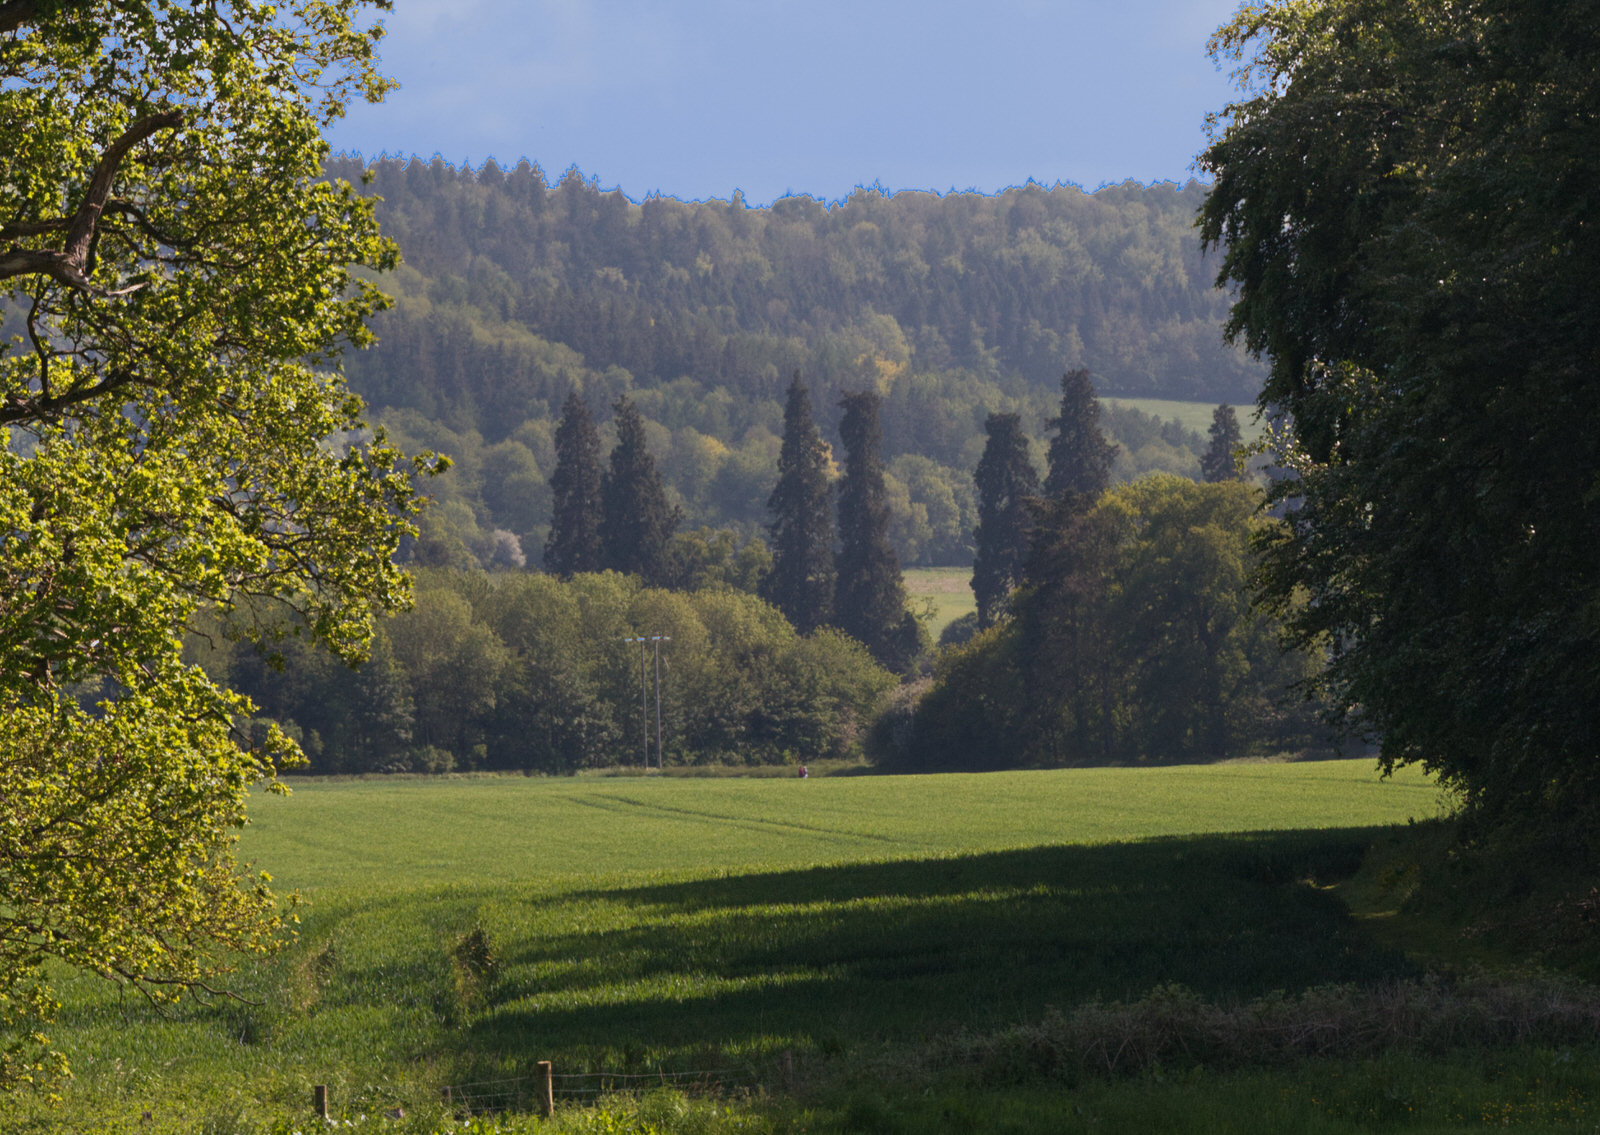 Green field with dark green hillside beyond and blue sky -- growing season